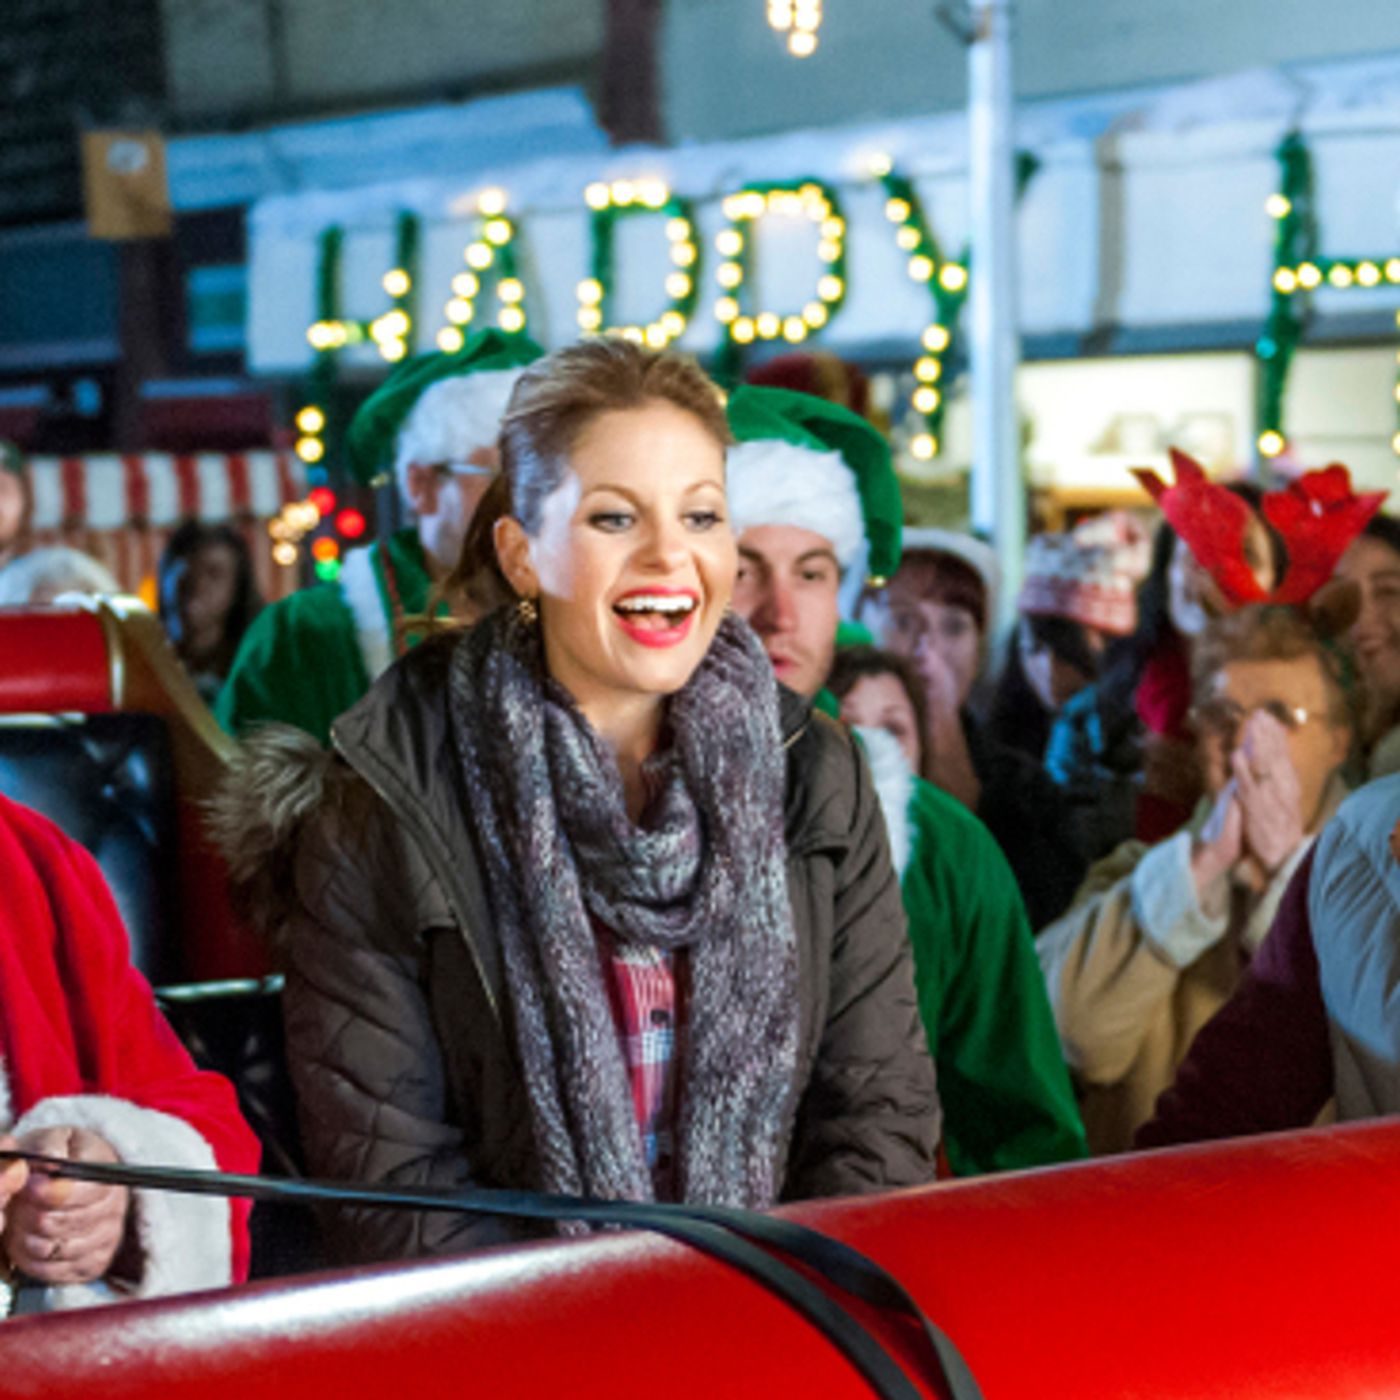 Enchanted Christmas Hallmark.12 Mostly Holiday Movies Filmed In Utah Deseret News